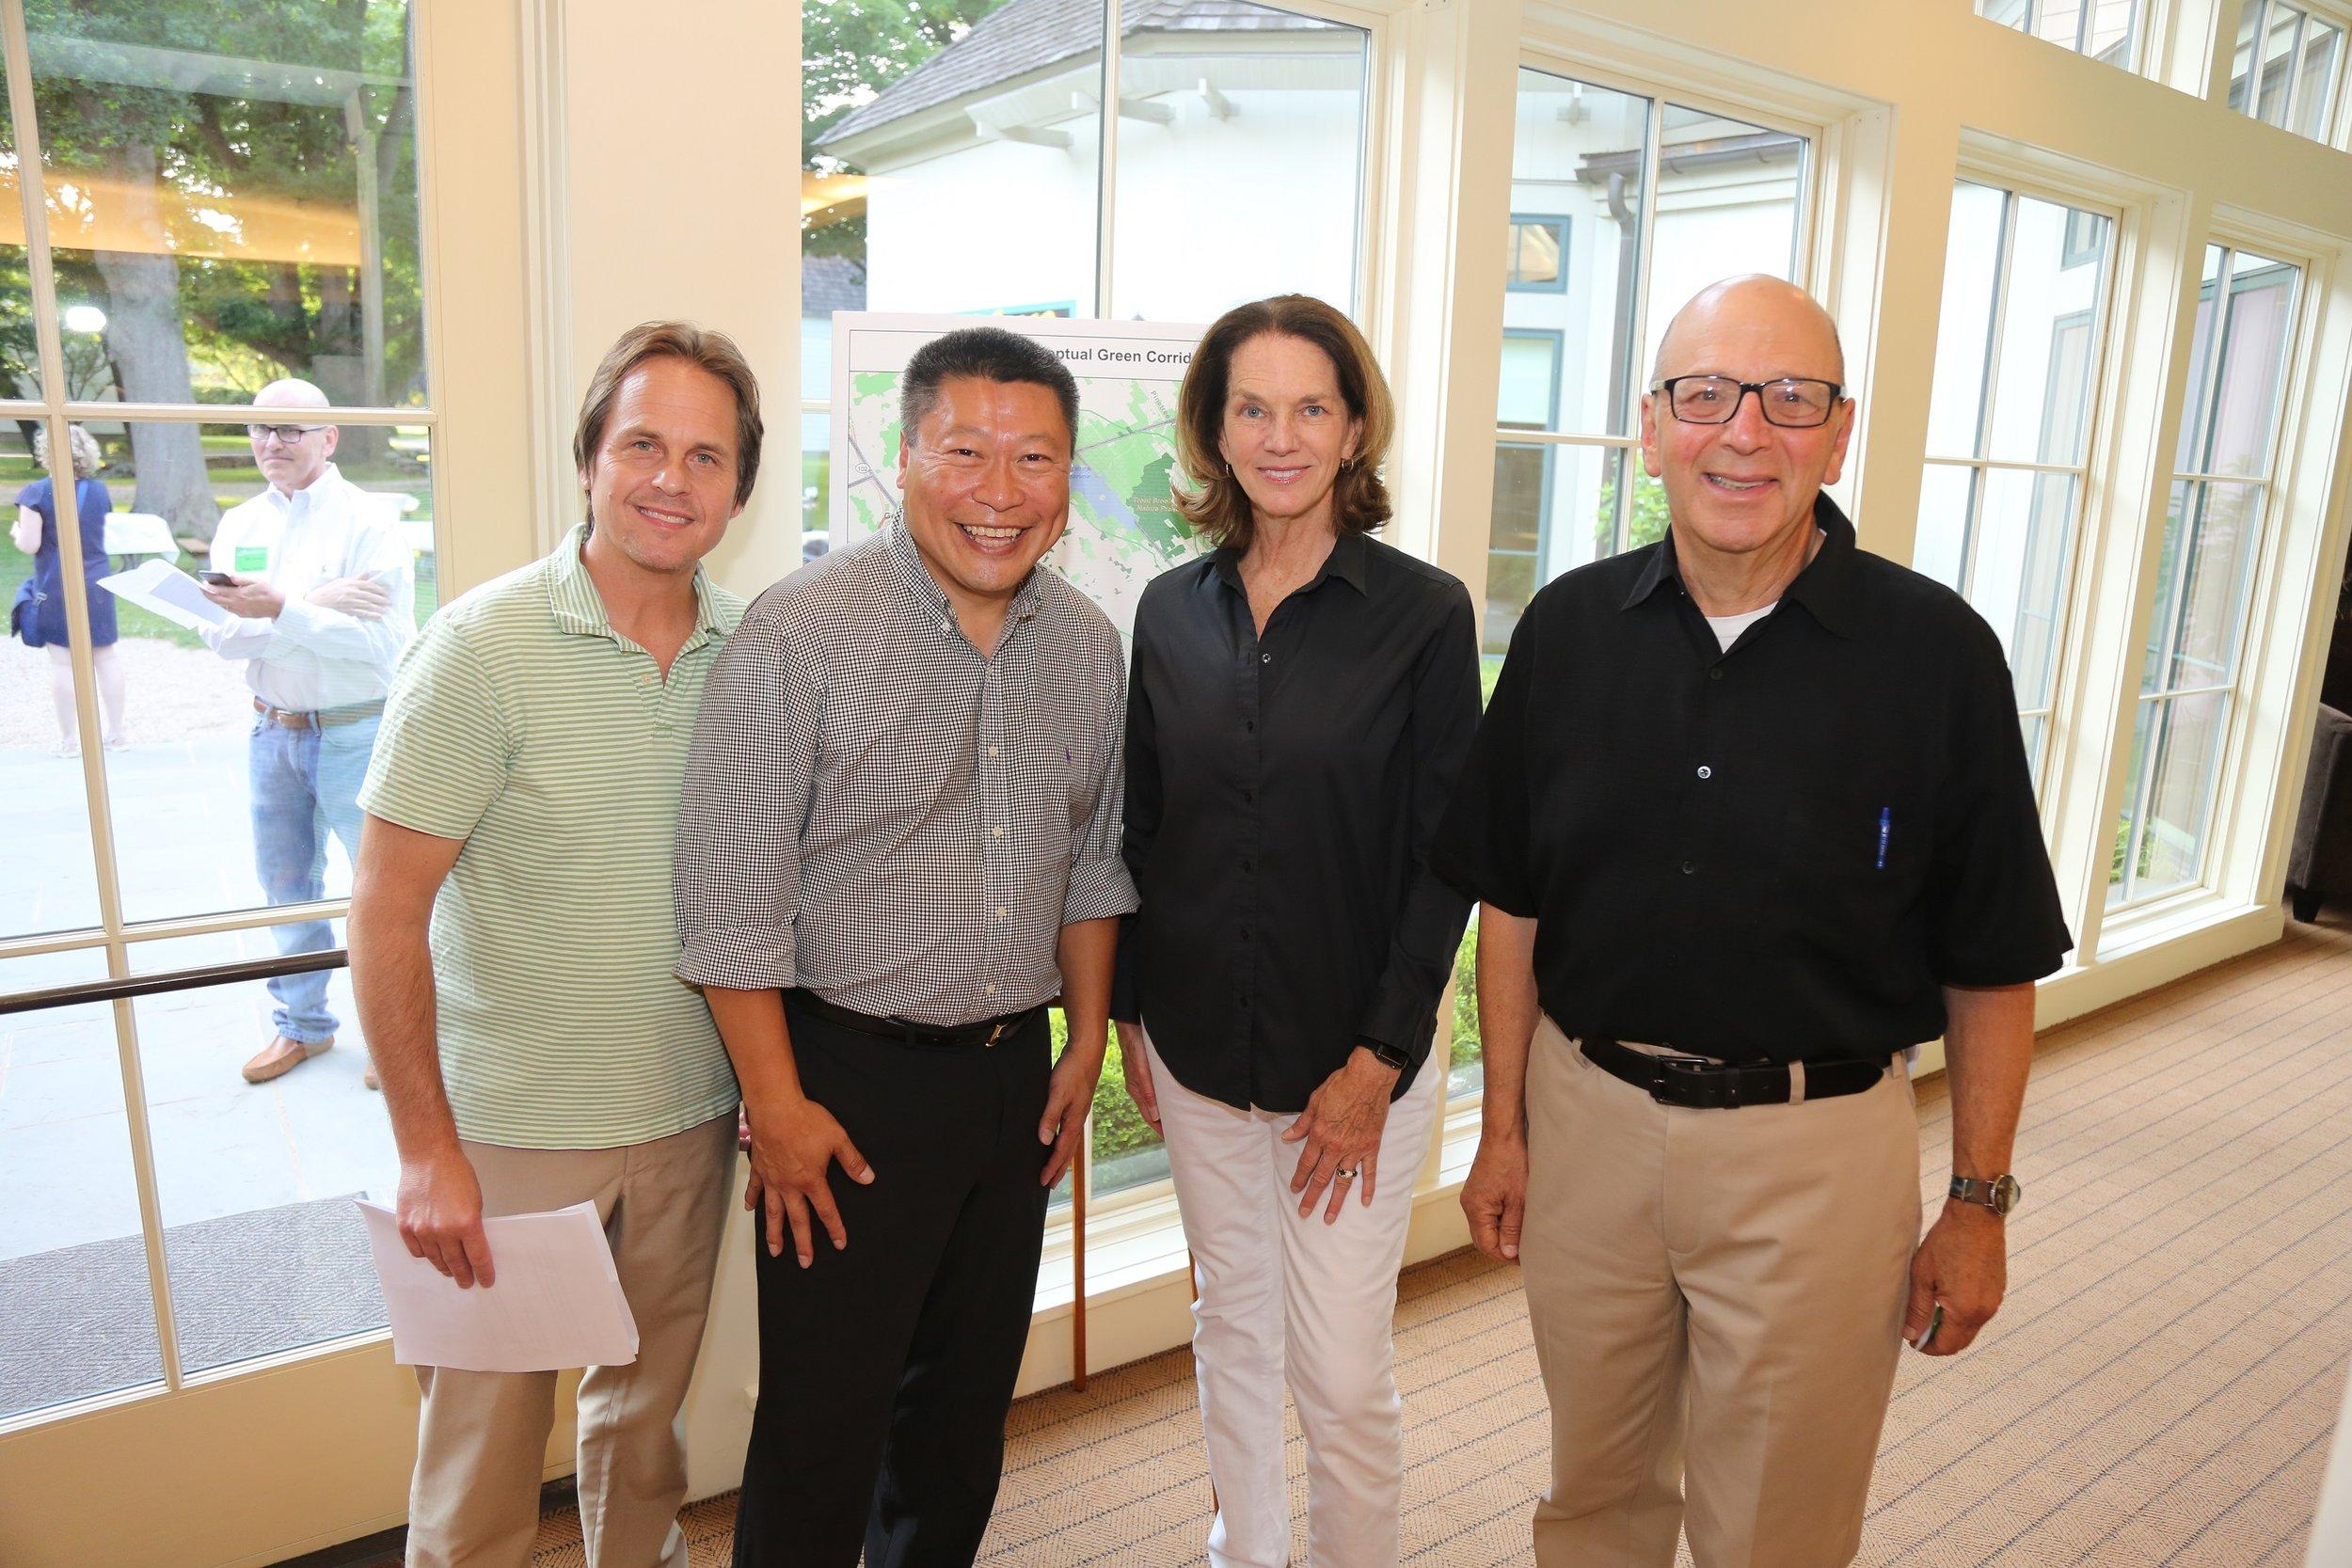 David Brant, Aspetuck Land Trust Executive Director; Tony Hwang, State Senator; Nancy Moon, Board of Directors; Don Hyman, Aspetuck Land Trust Board President.